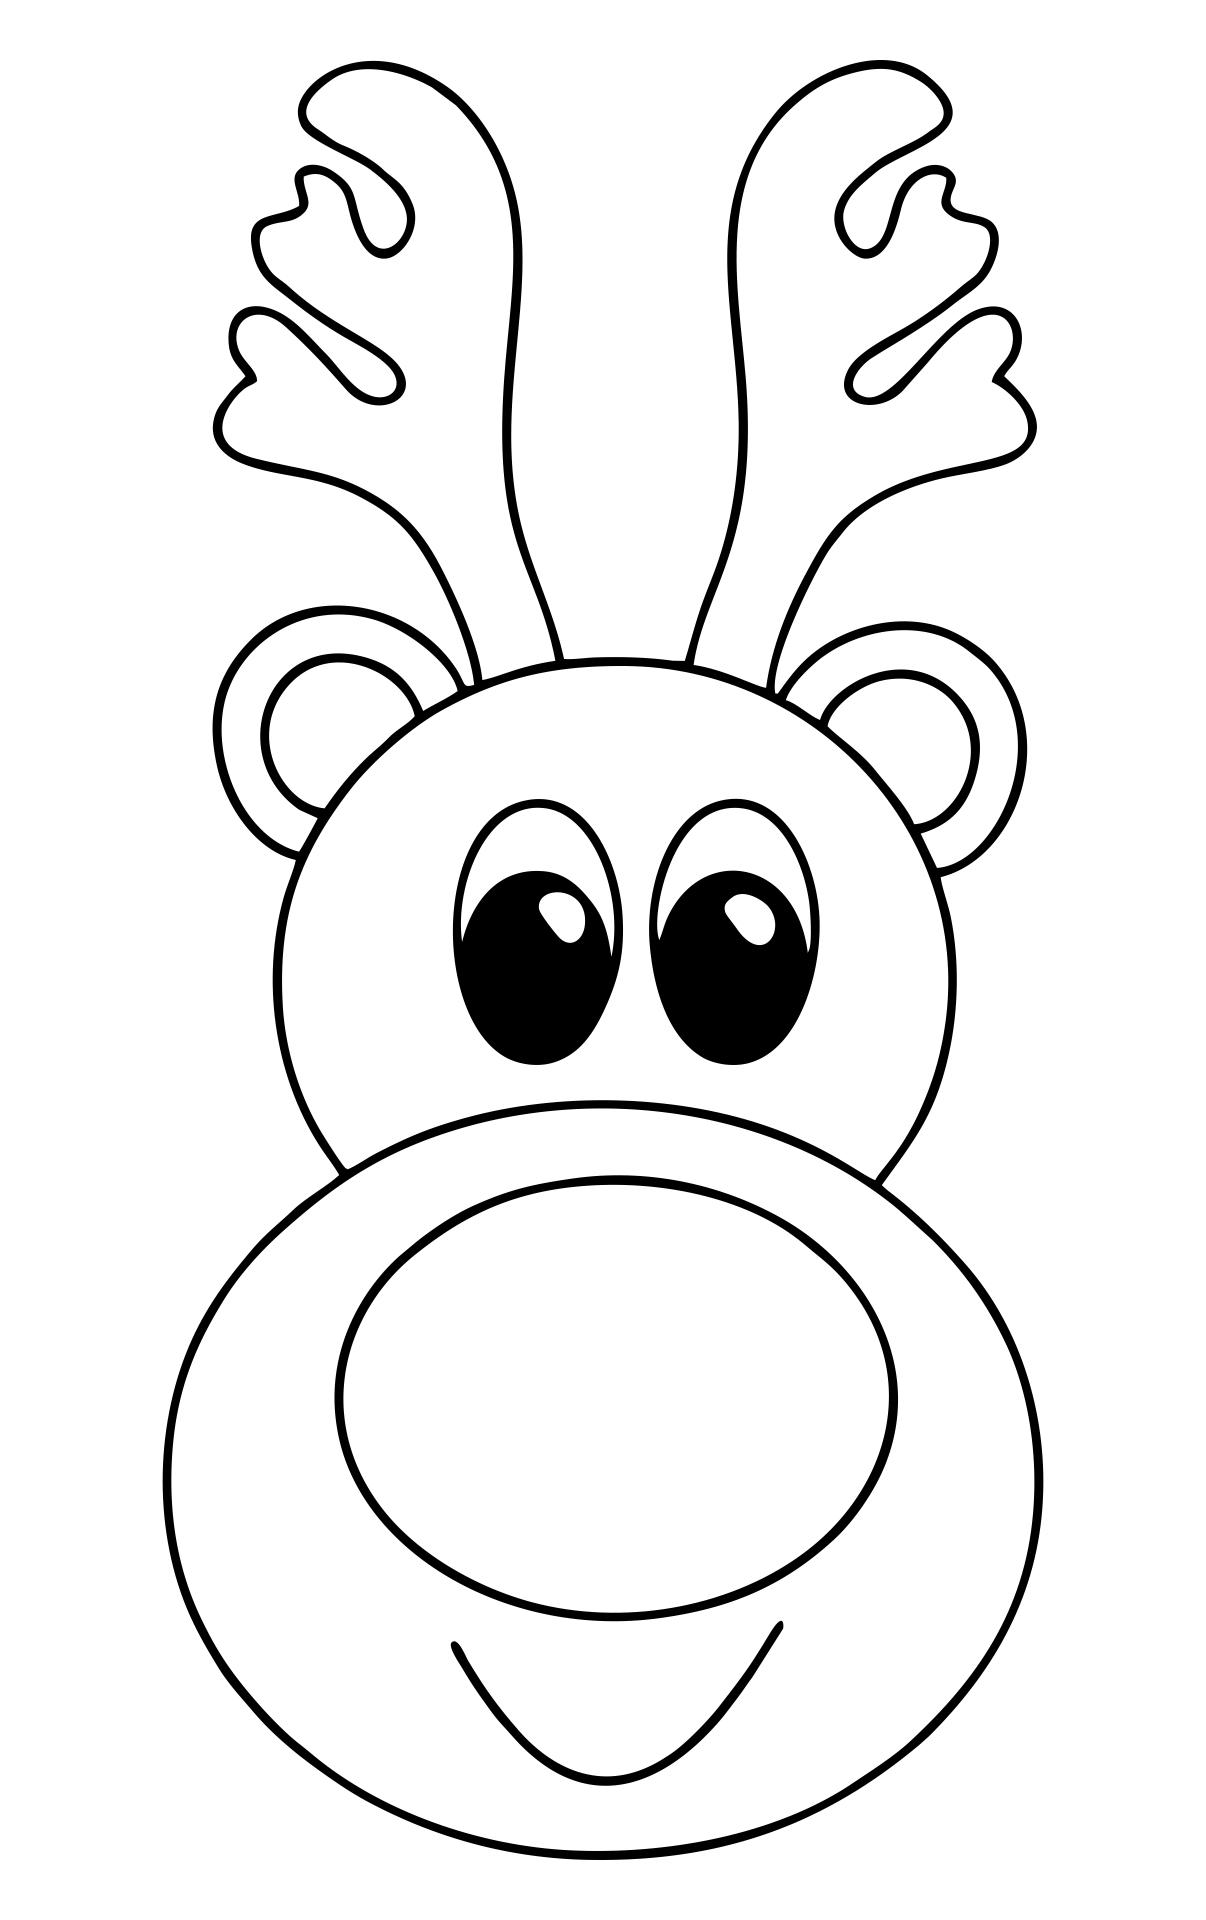 Reindeer Face Template Printable